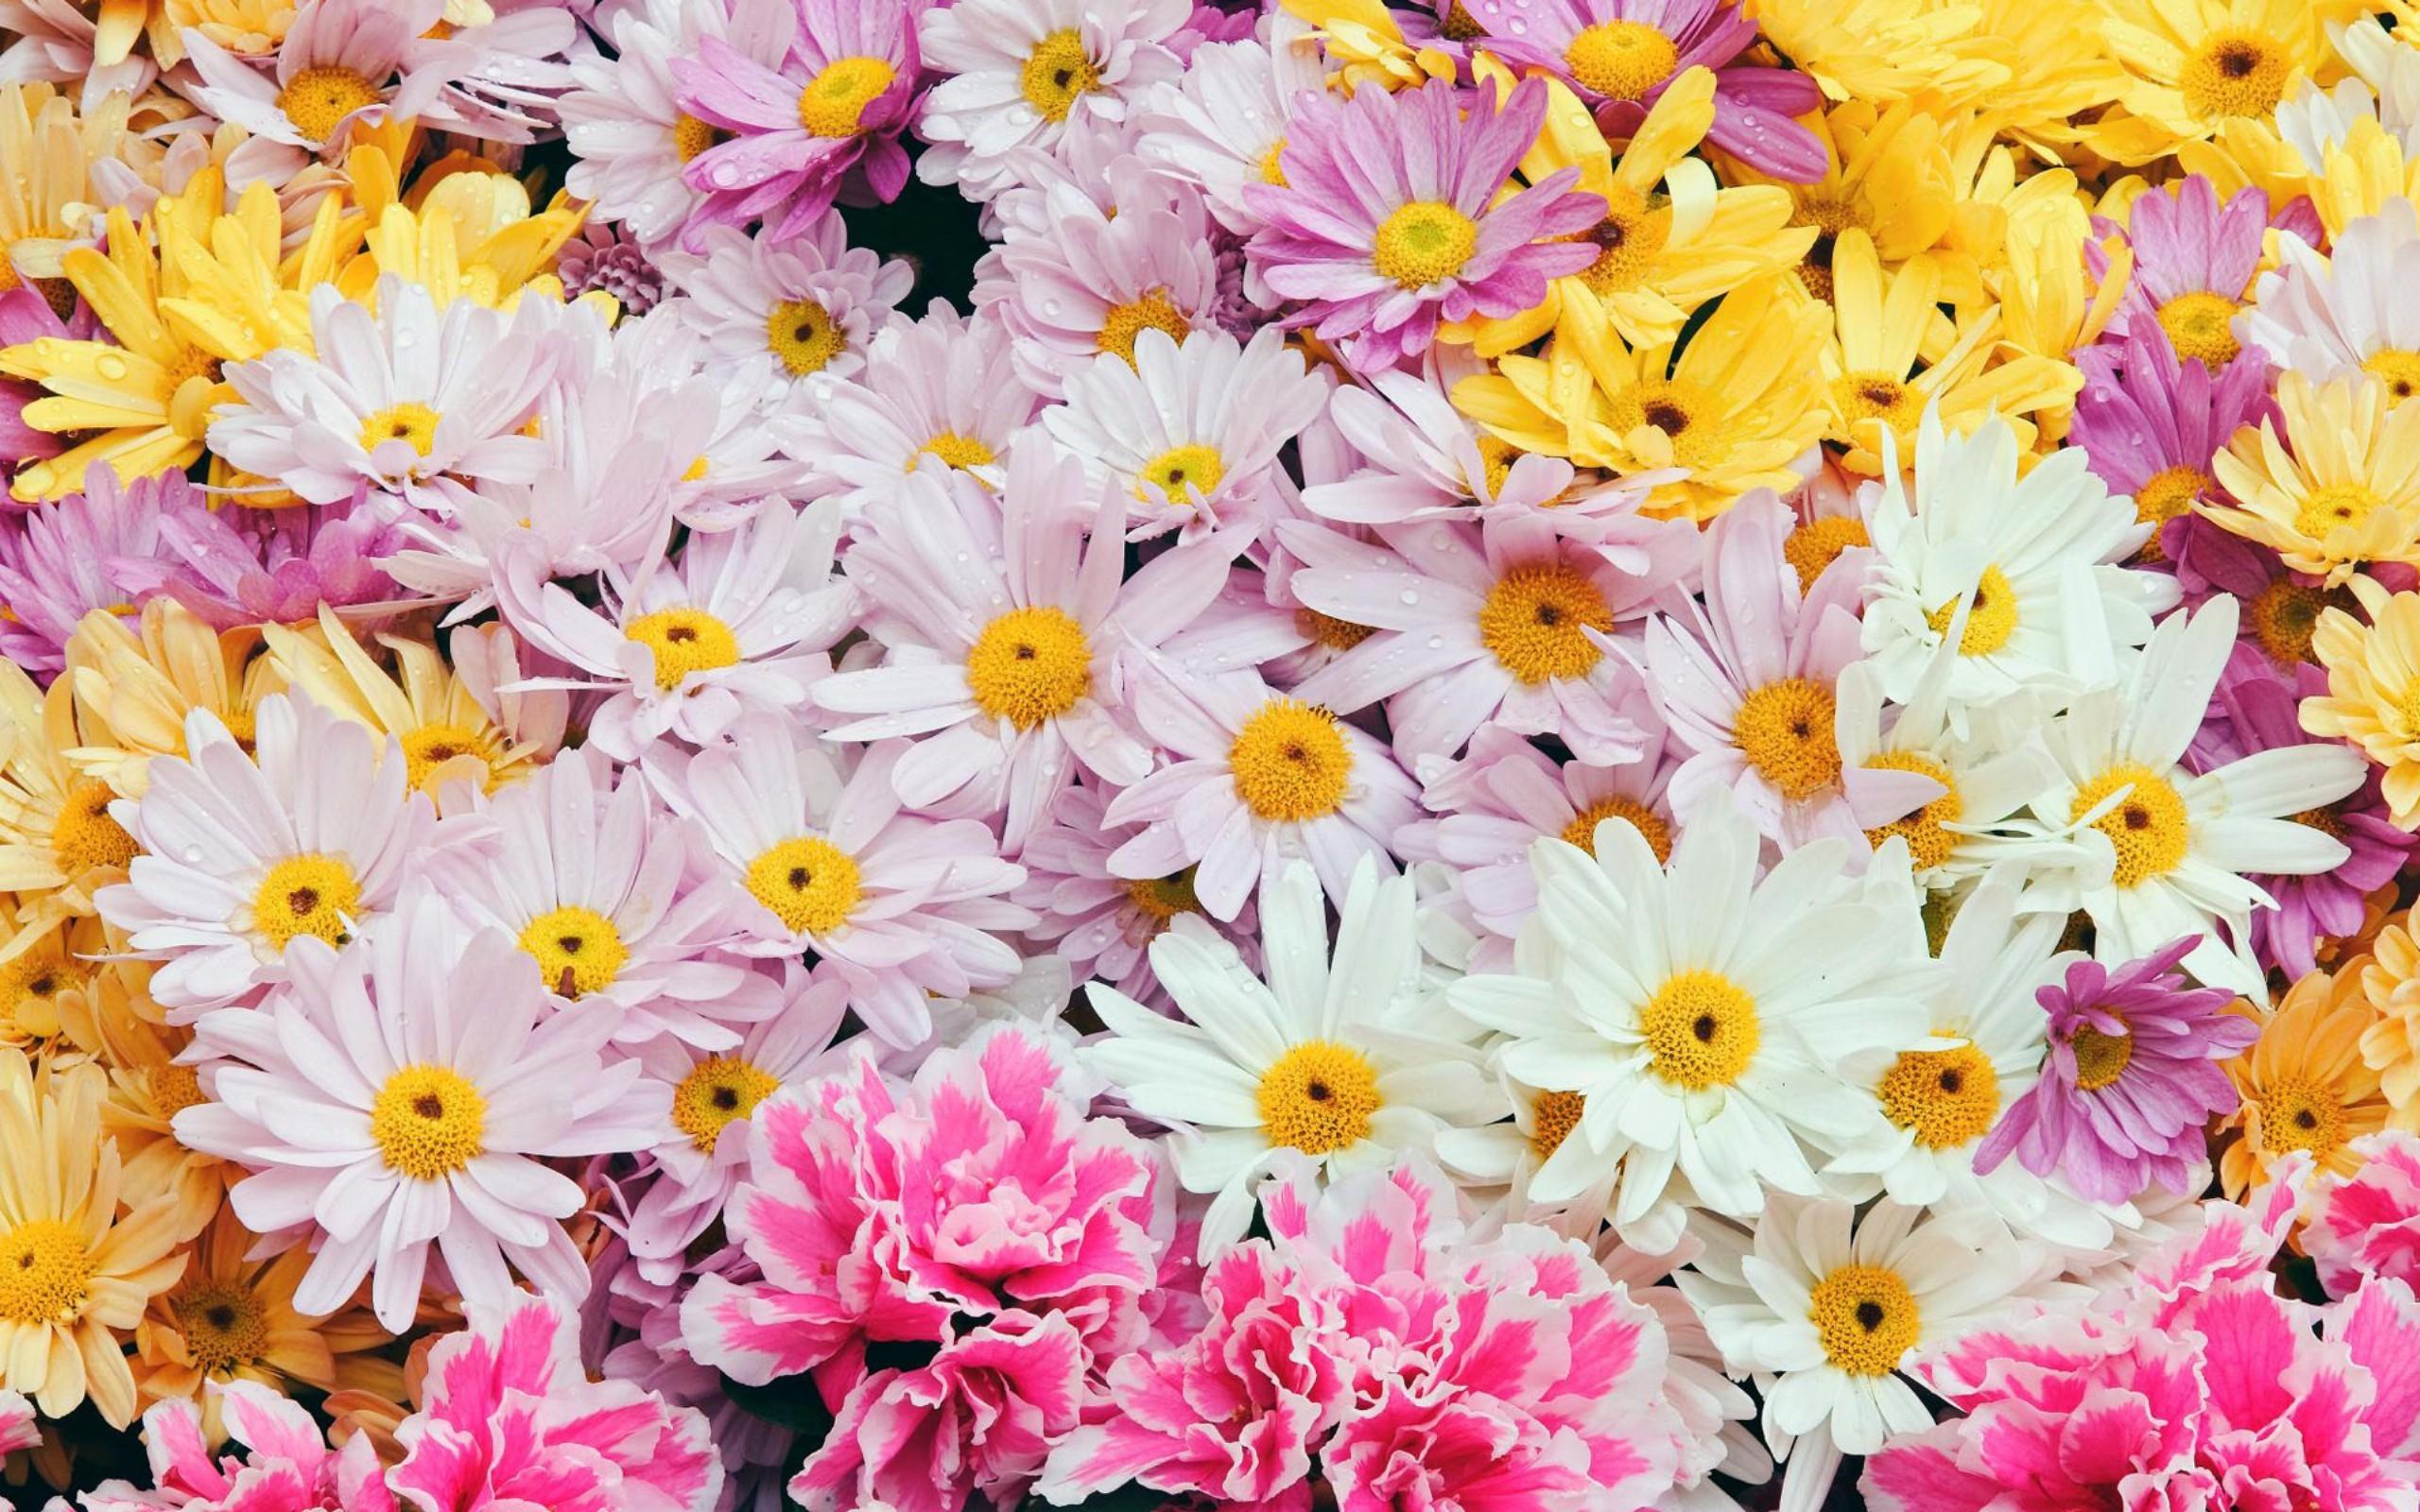 Flores margaritas de colores - 2560x1600